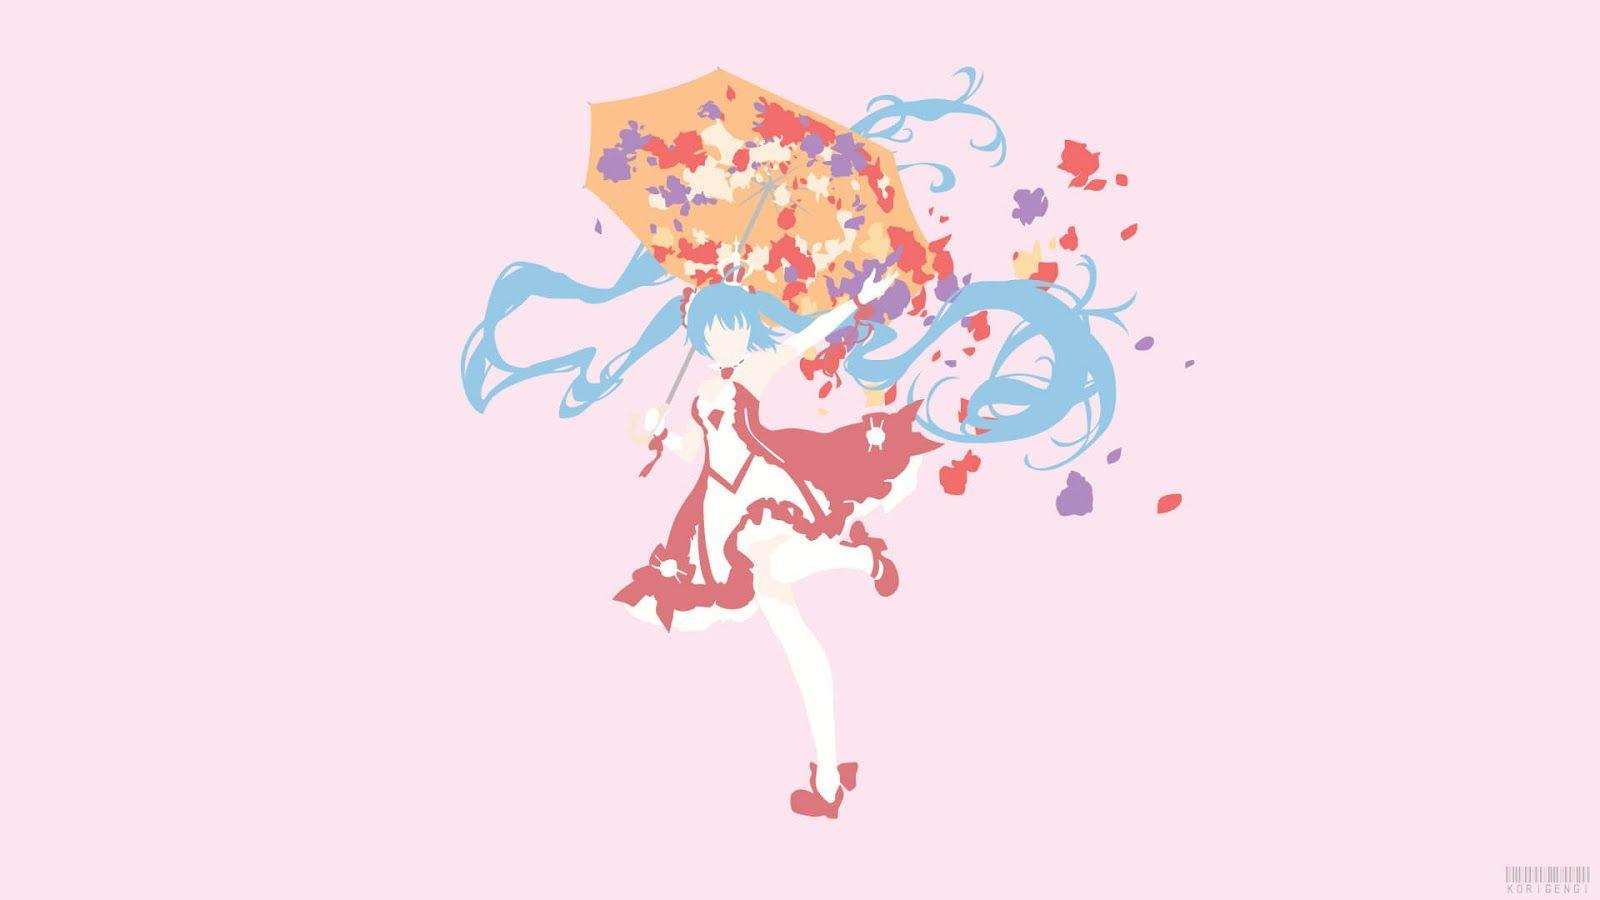 Pc Hatsune Miku Vocaloid Wallpaper Animasi Wallpaper Iphone